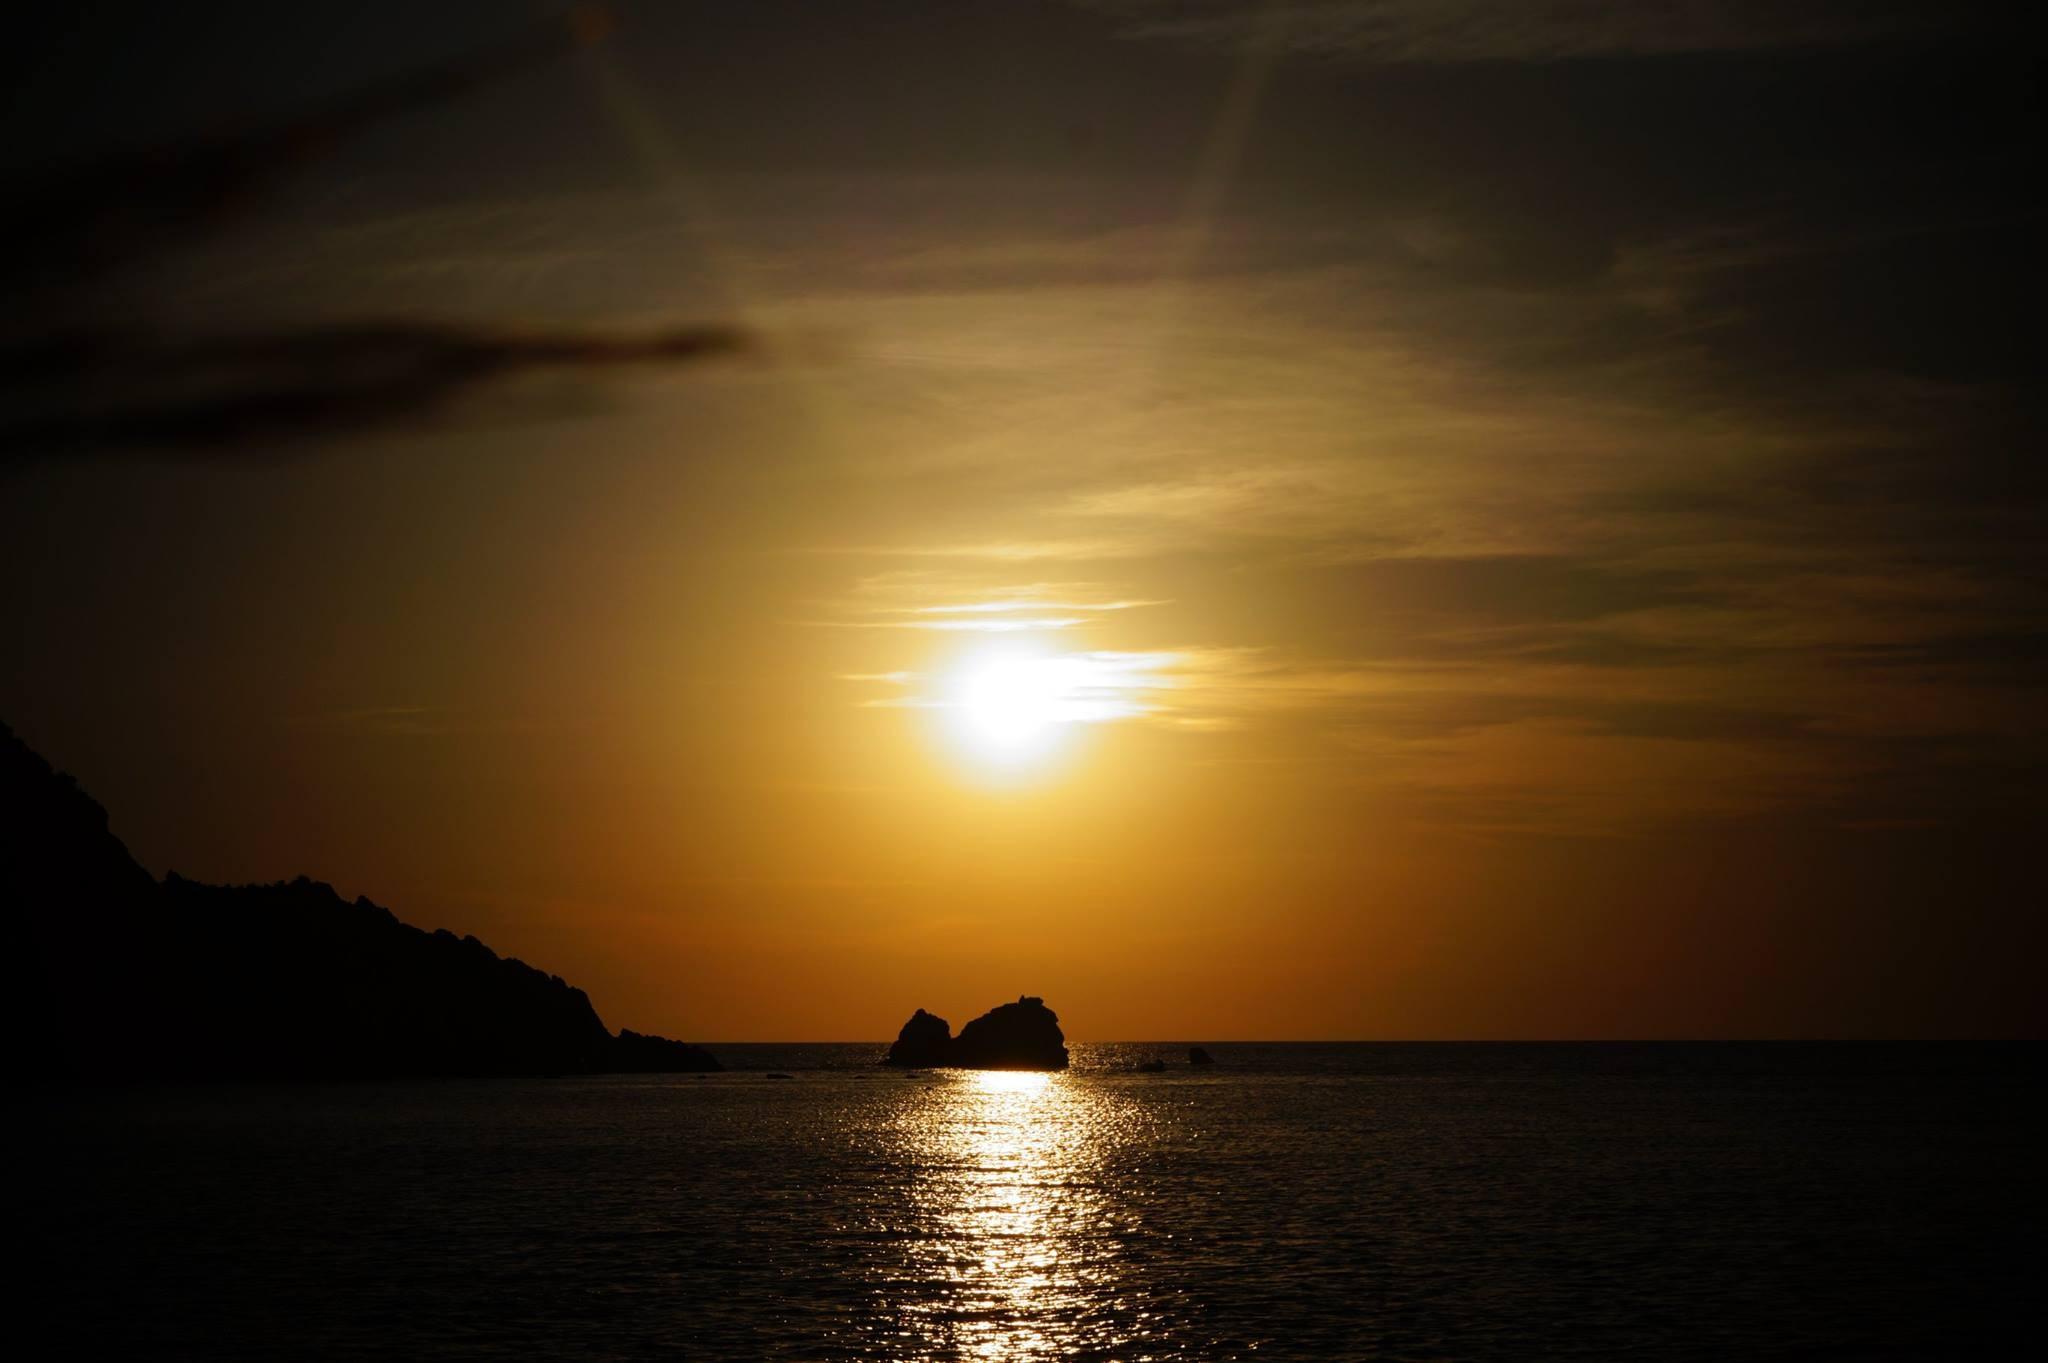 sunset & sea by evamil